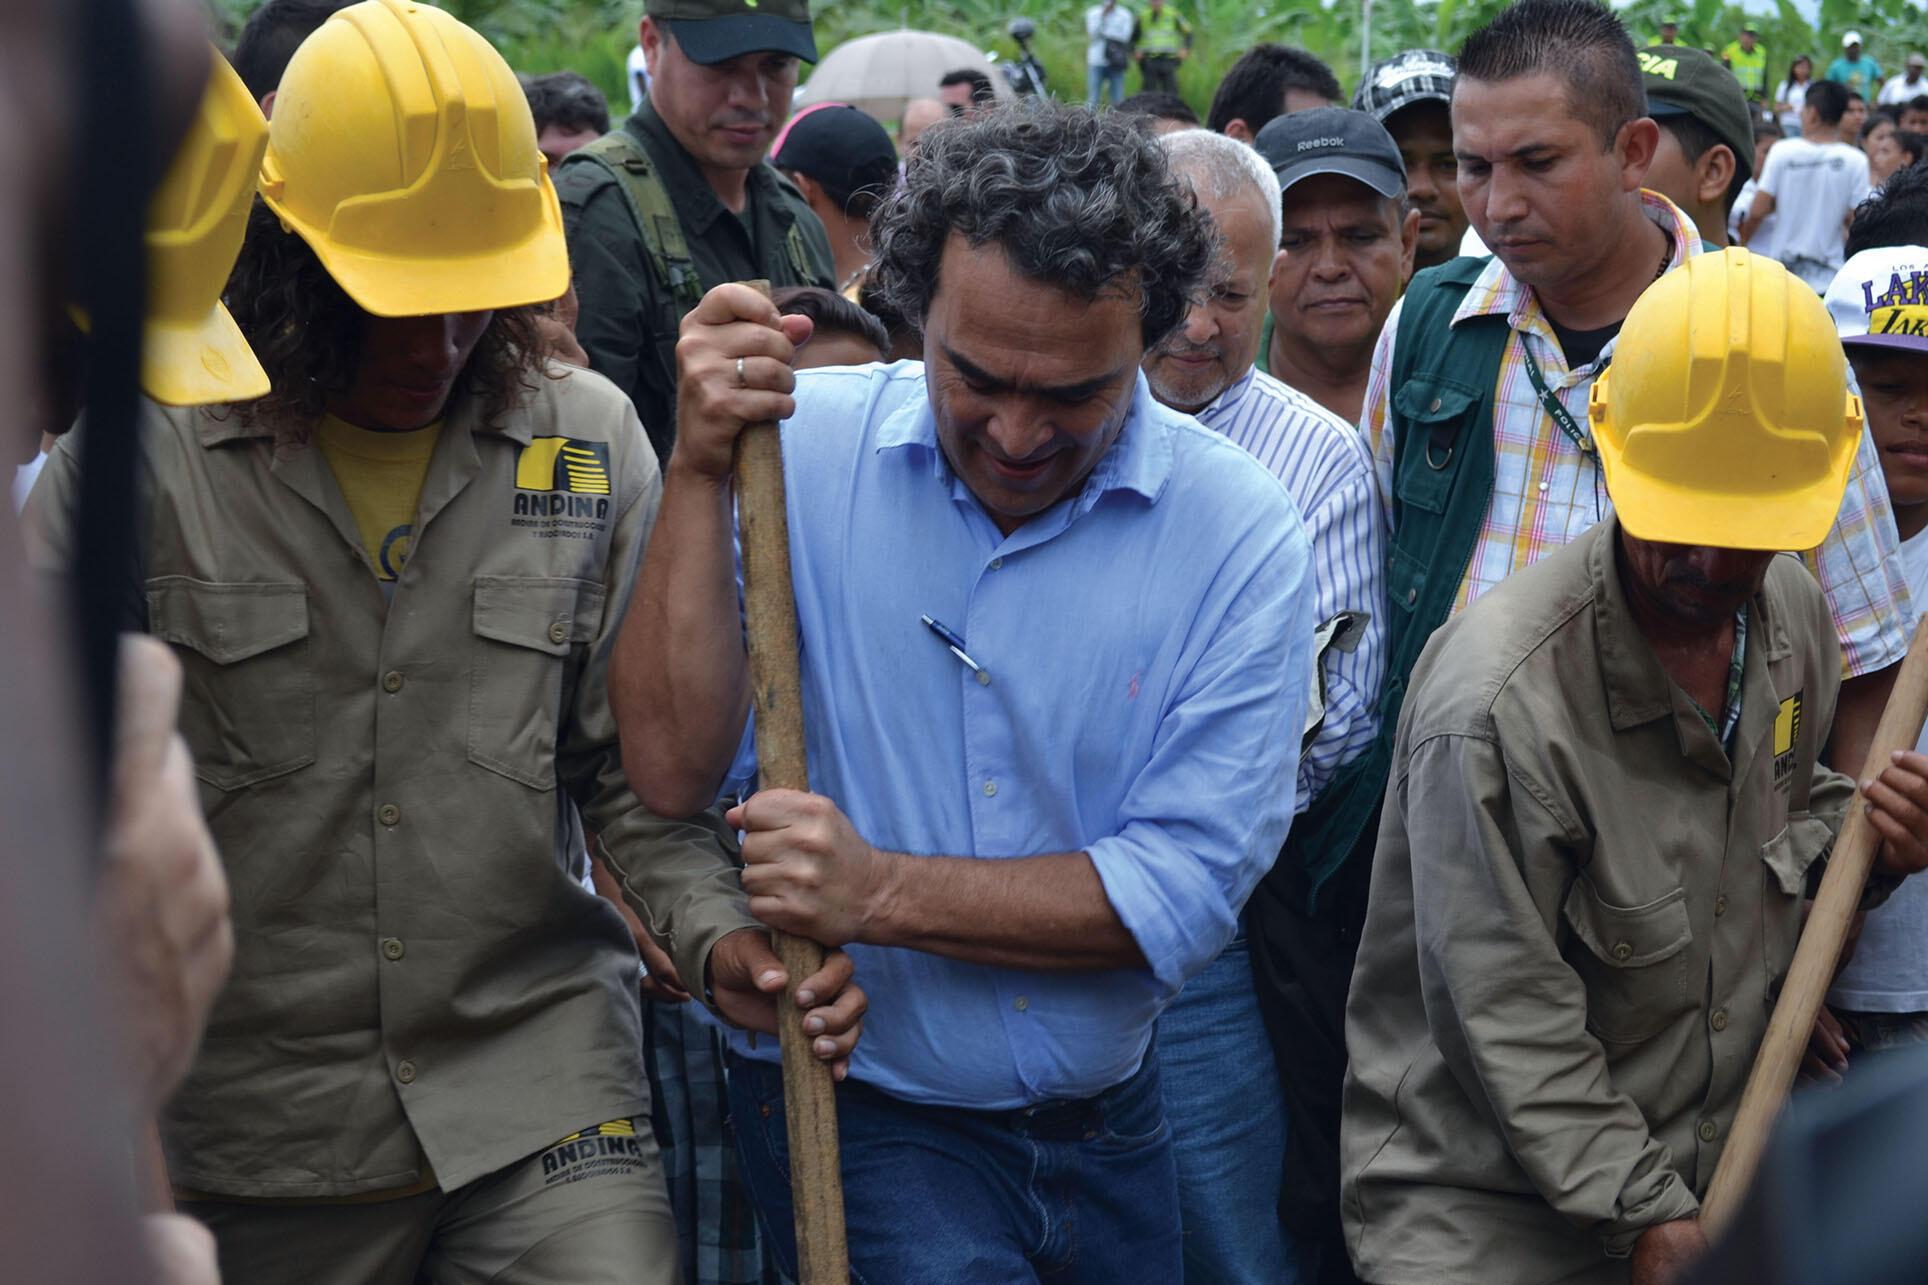 Sergio Fajardo (center, with other workers) uses a shovel to help break ground for a new university building in Antioquia. (Photo courtesy of Gobernador de Antioquia.)